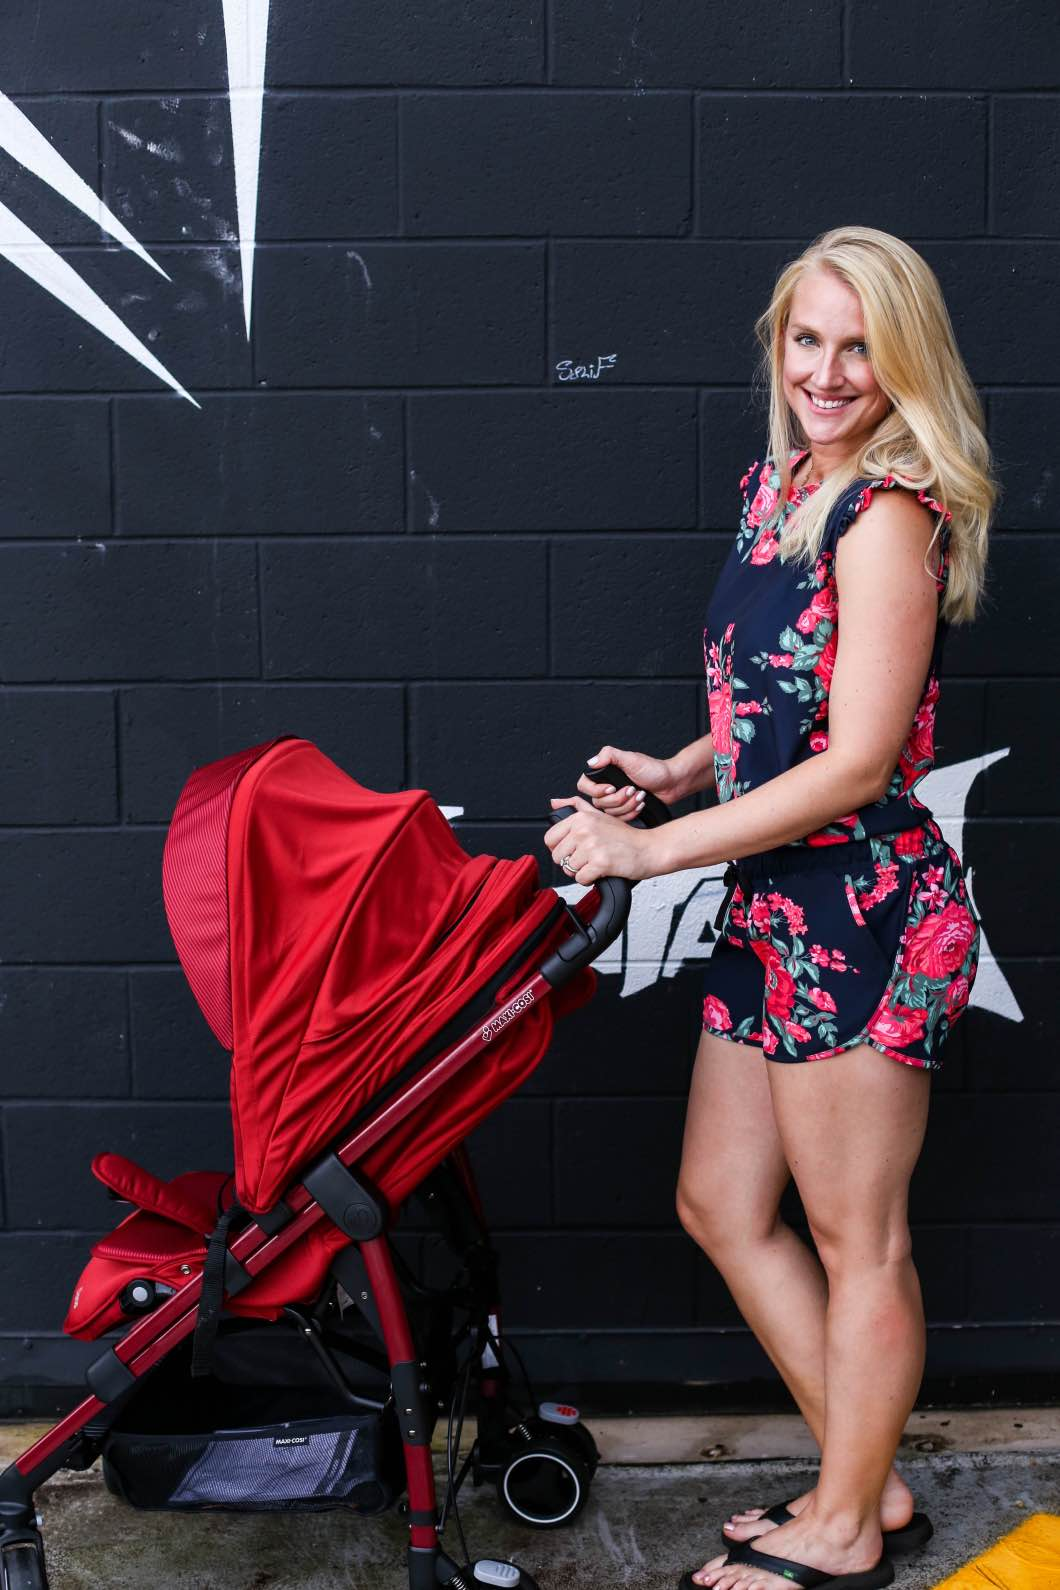 Maxi Cosi Dana Stroller Review by Atlanta blogger Jessica of Happily Hughes